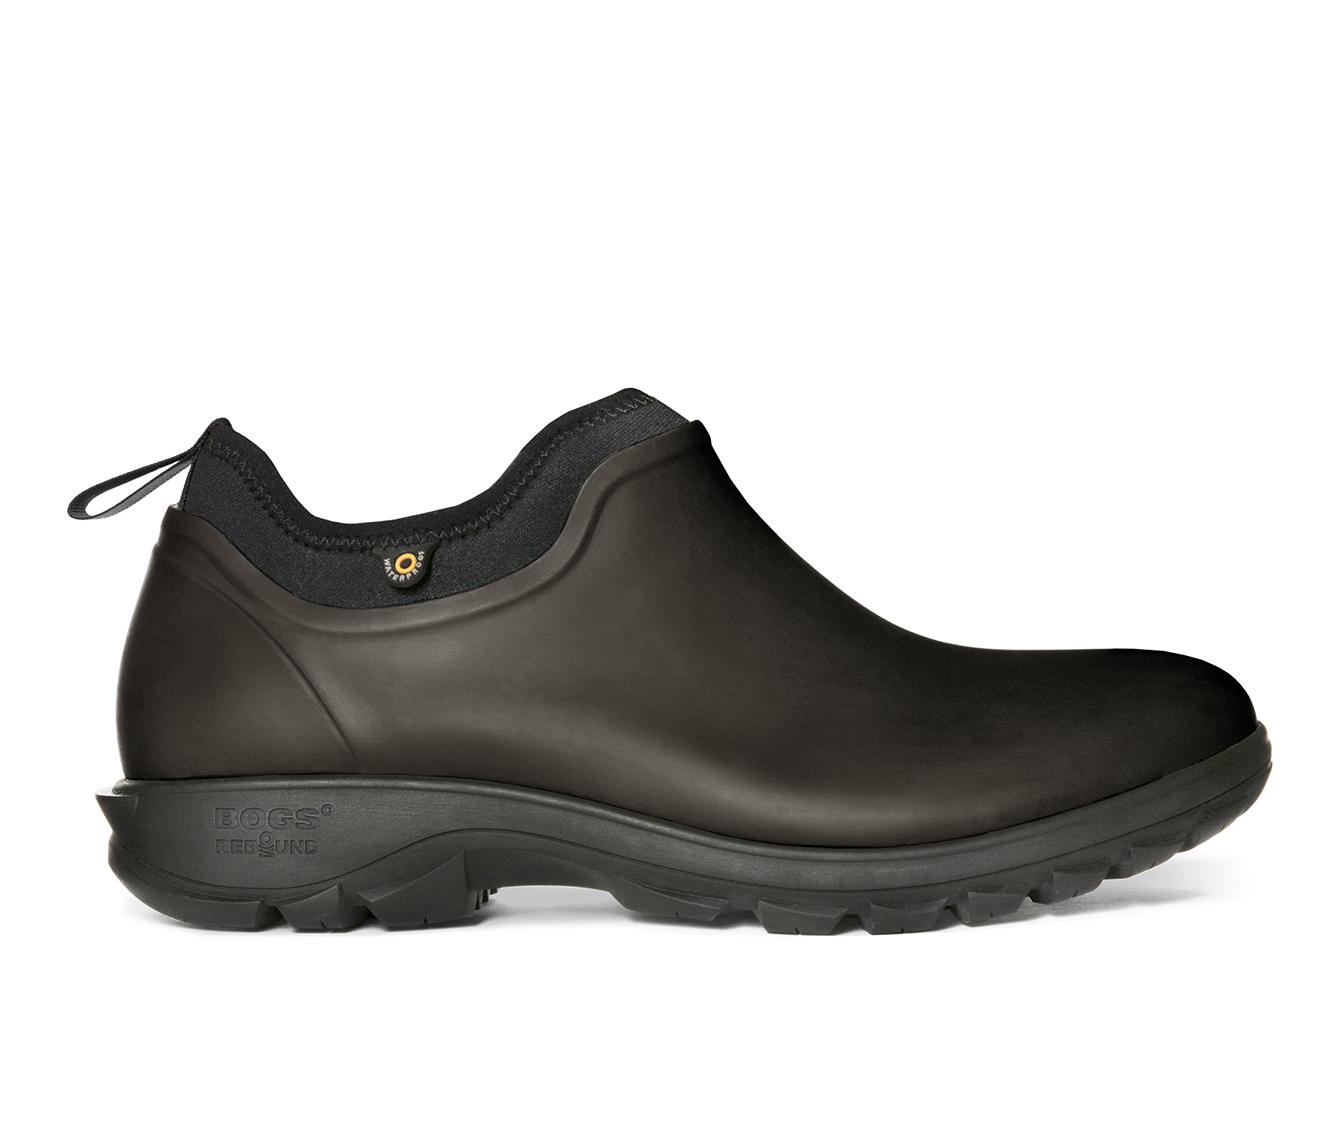 Bogs Footwear Sauvie SR Slip-On Men's Boots (Brown Faux Leather)